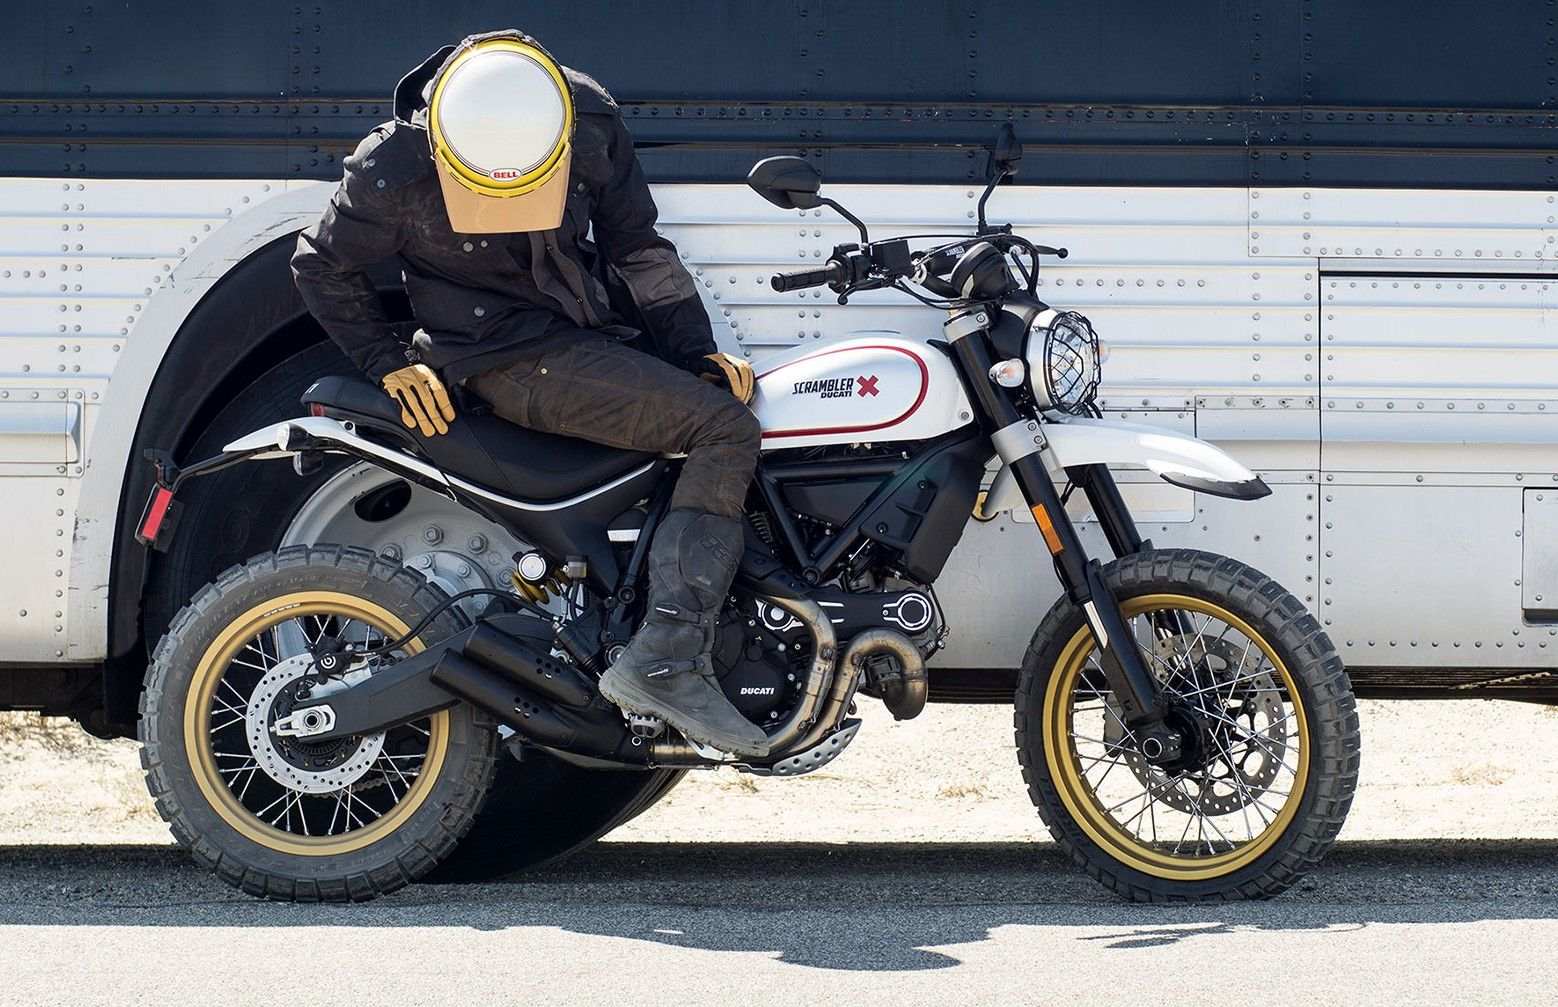 Ducati Scrambler Desert Sled launch